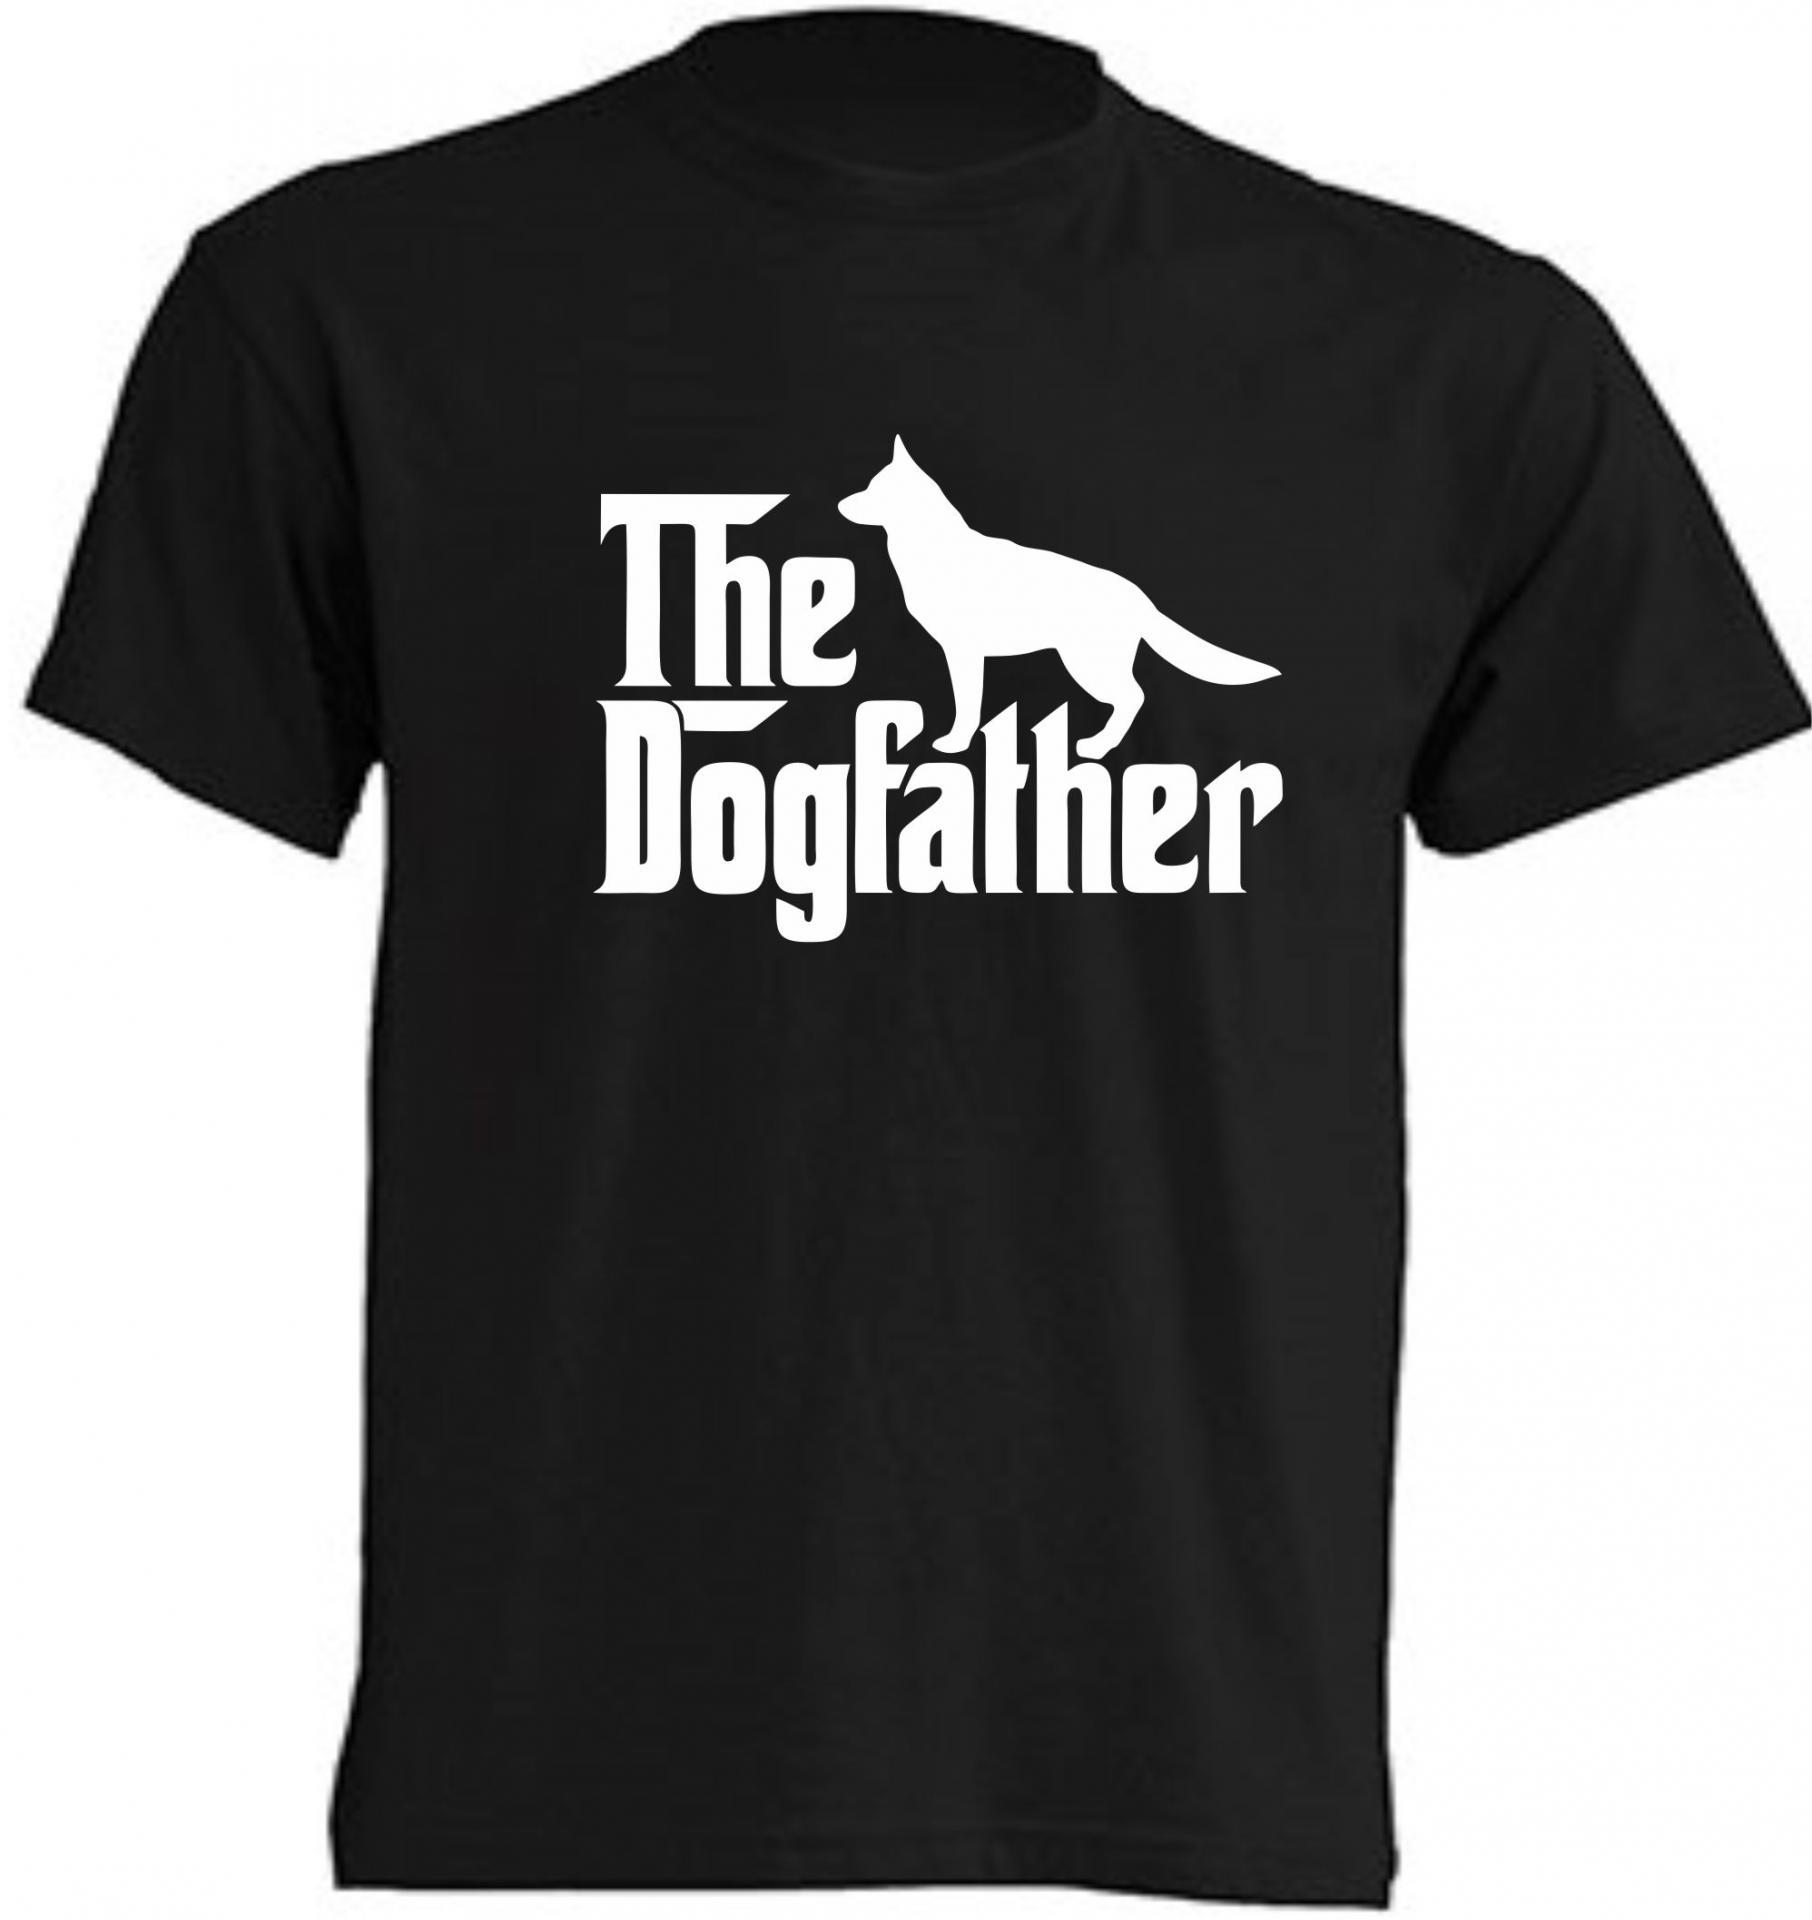 Camiseta The dogfather